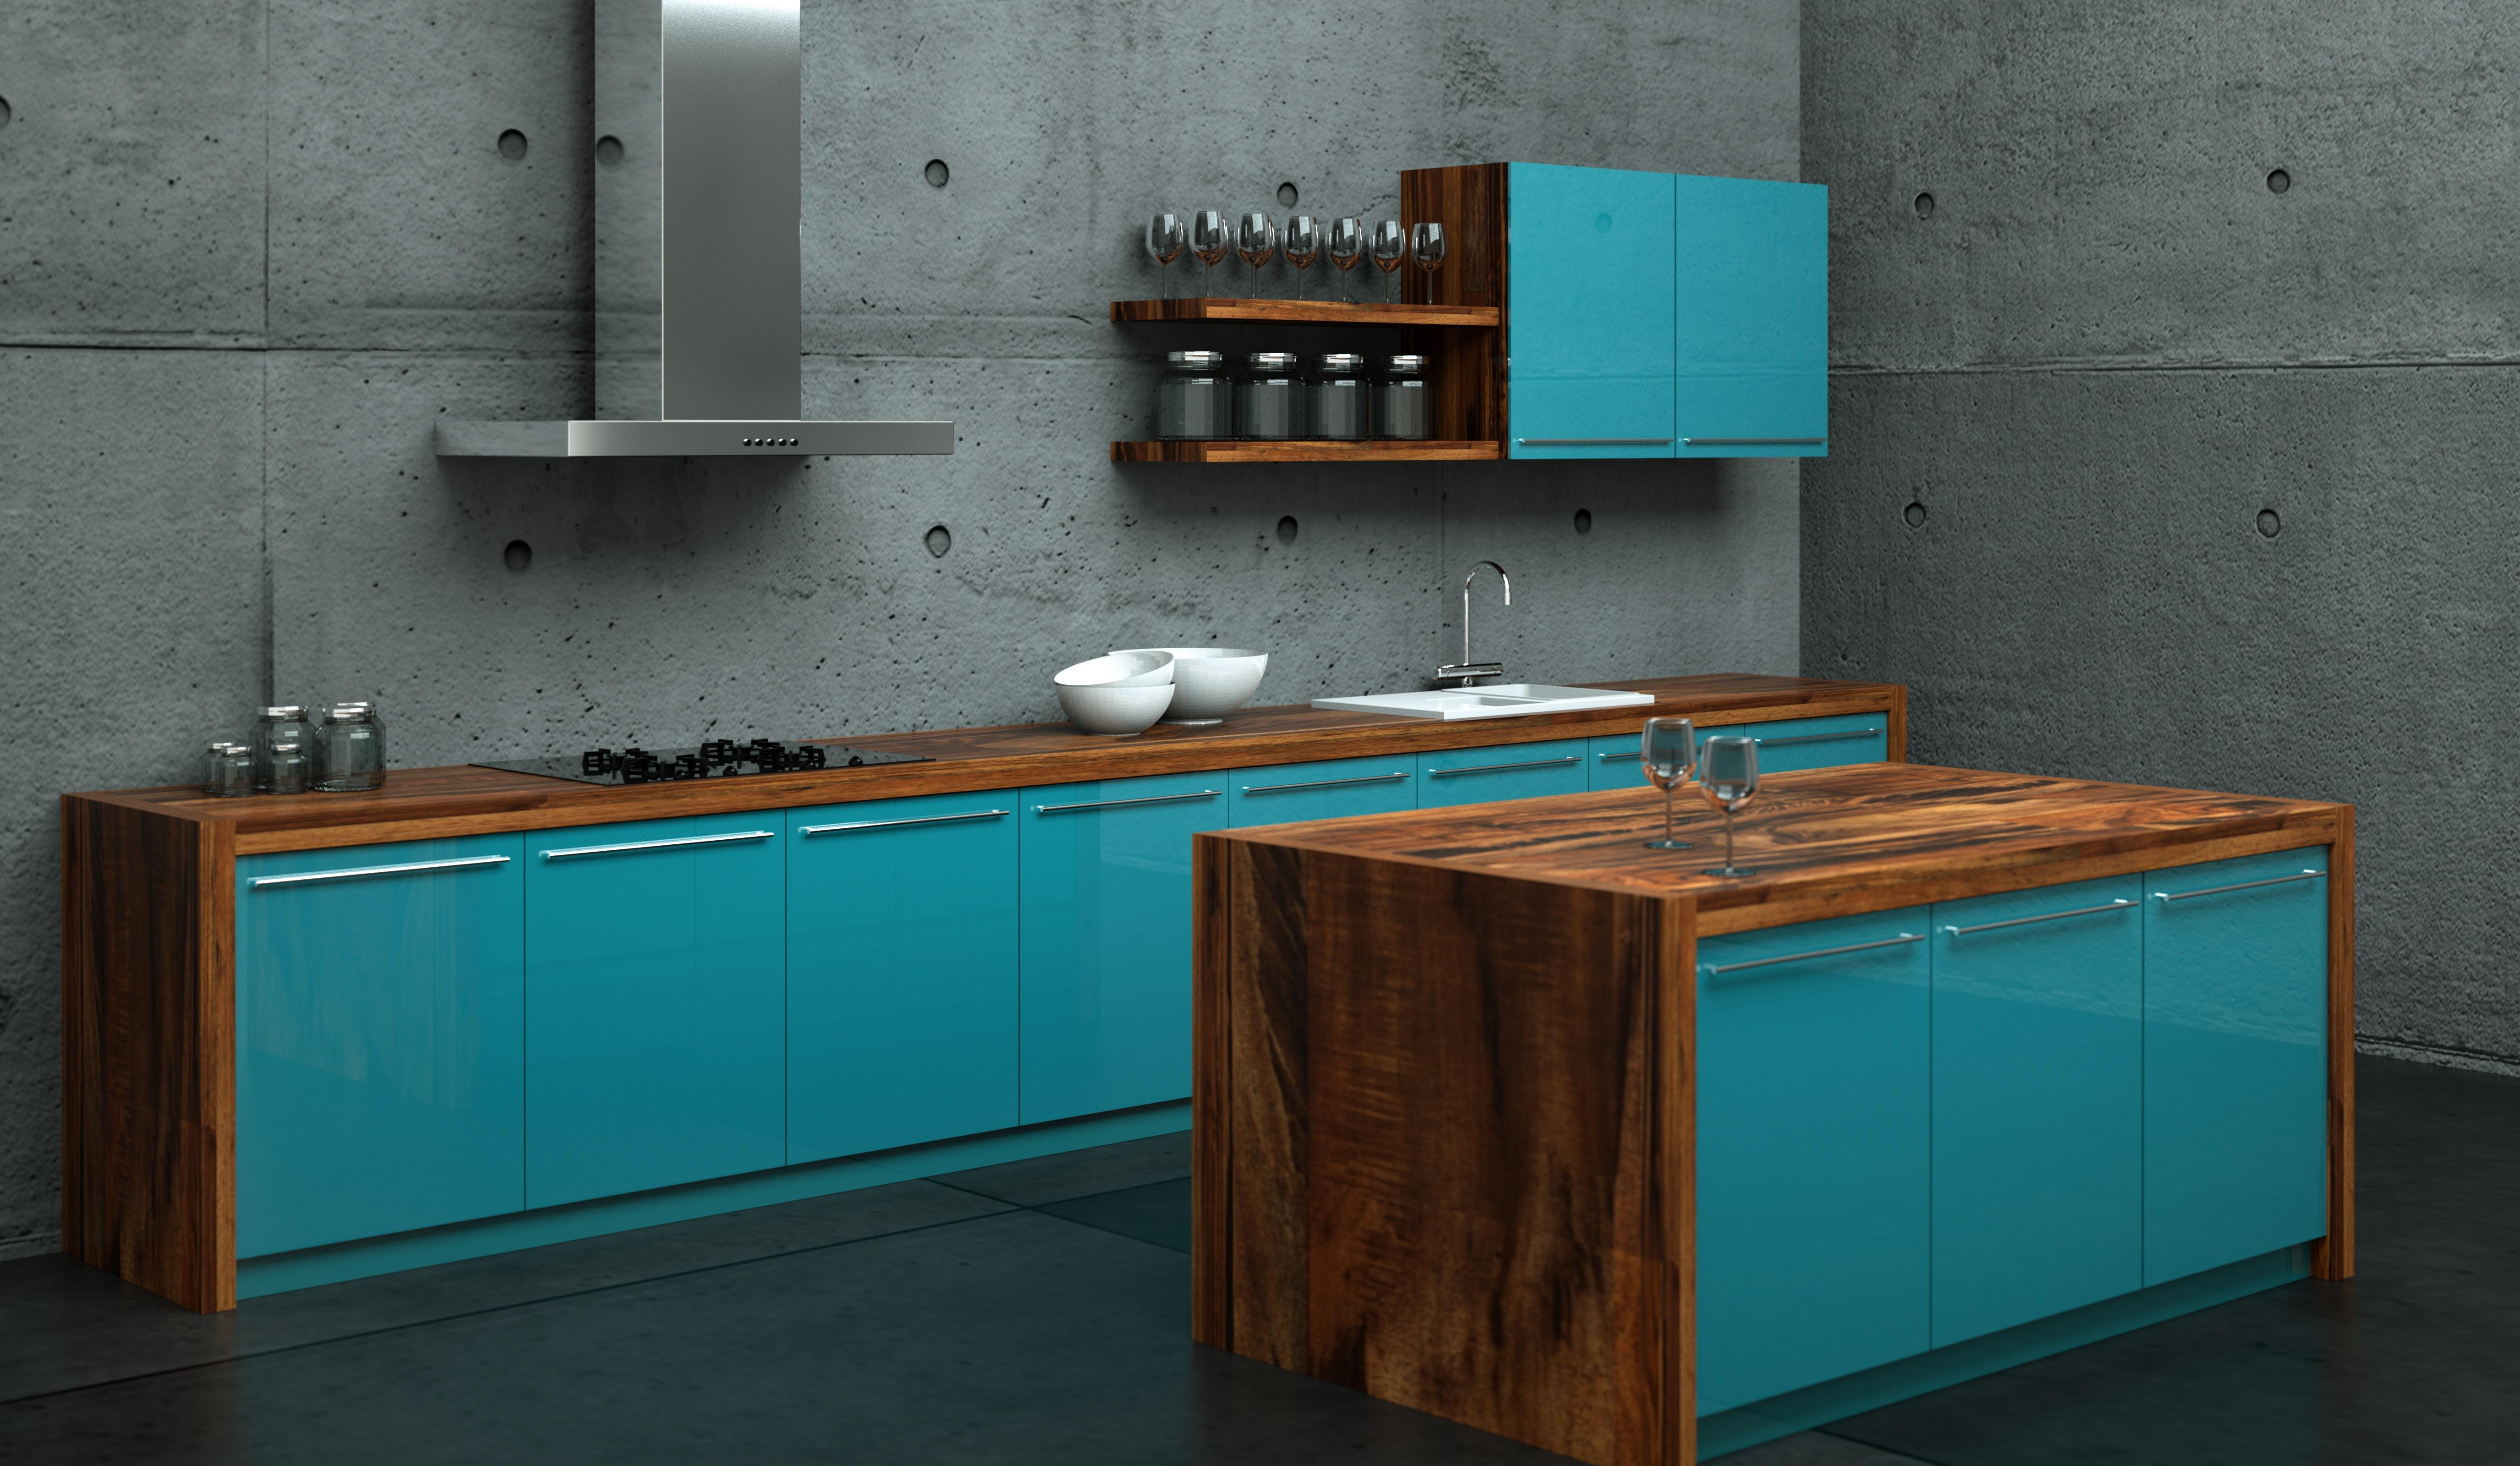 Keuken Schilderen Kleuren : Keukenfrontjes Verschillende keukenfrontjes